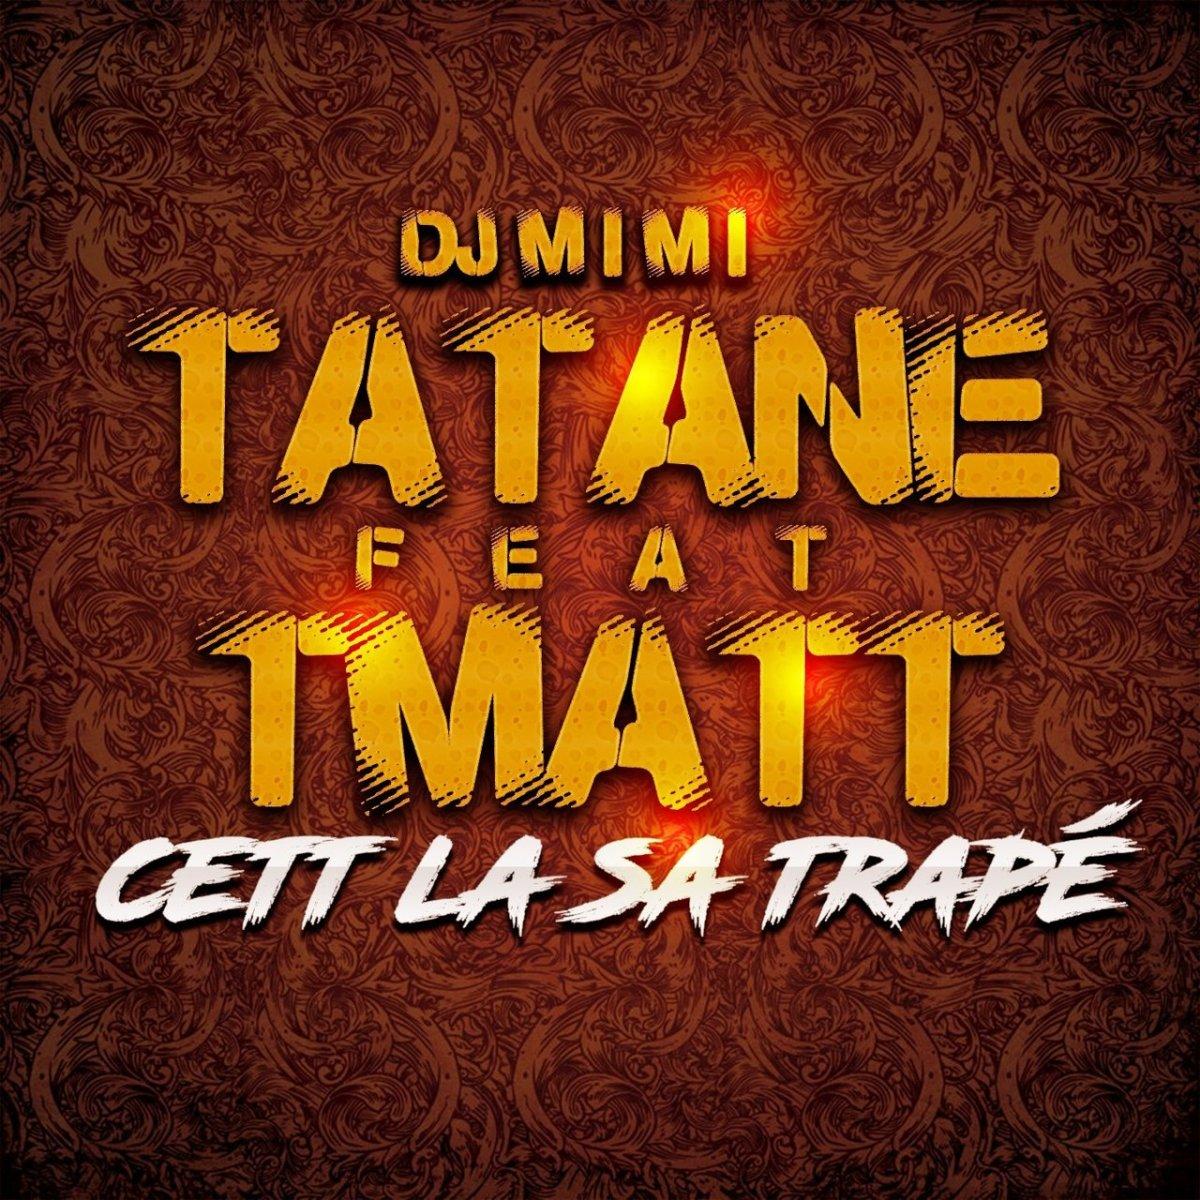 DJ Mimi - Cett La Sa Trapé (ft. Tatane and T Matt) (Cover)